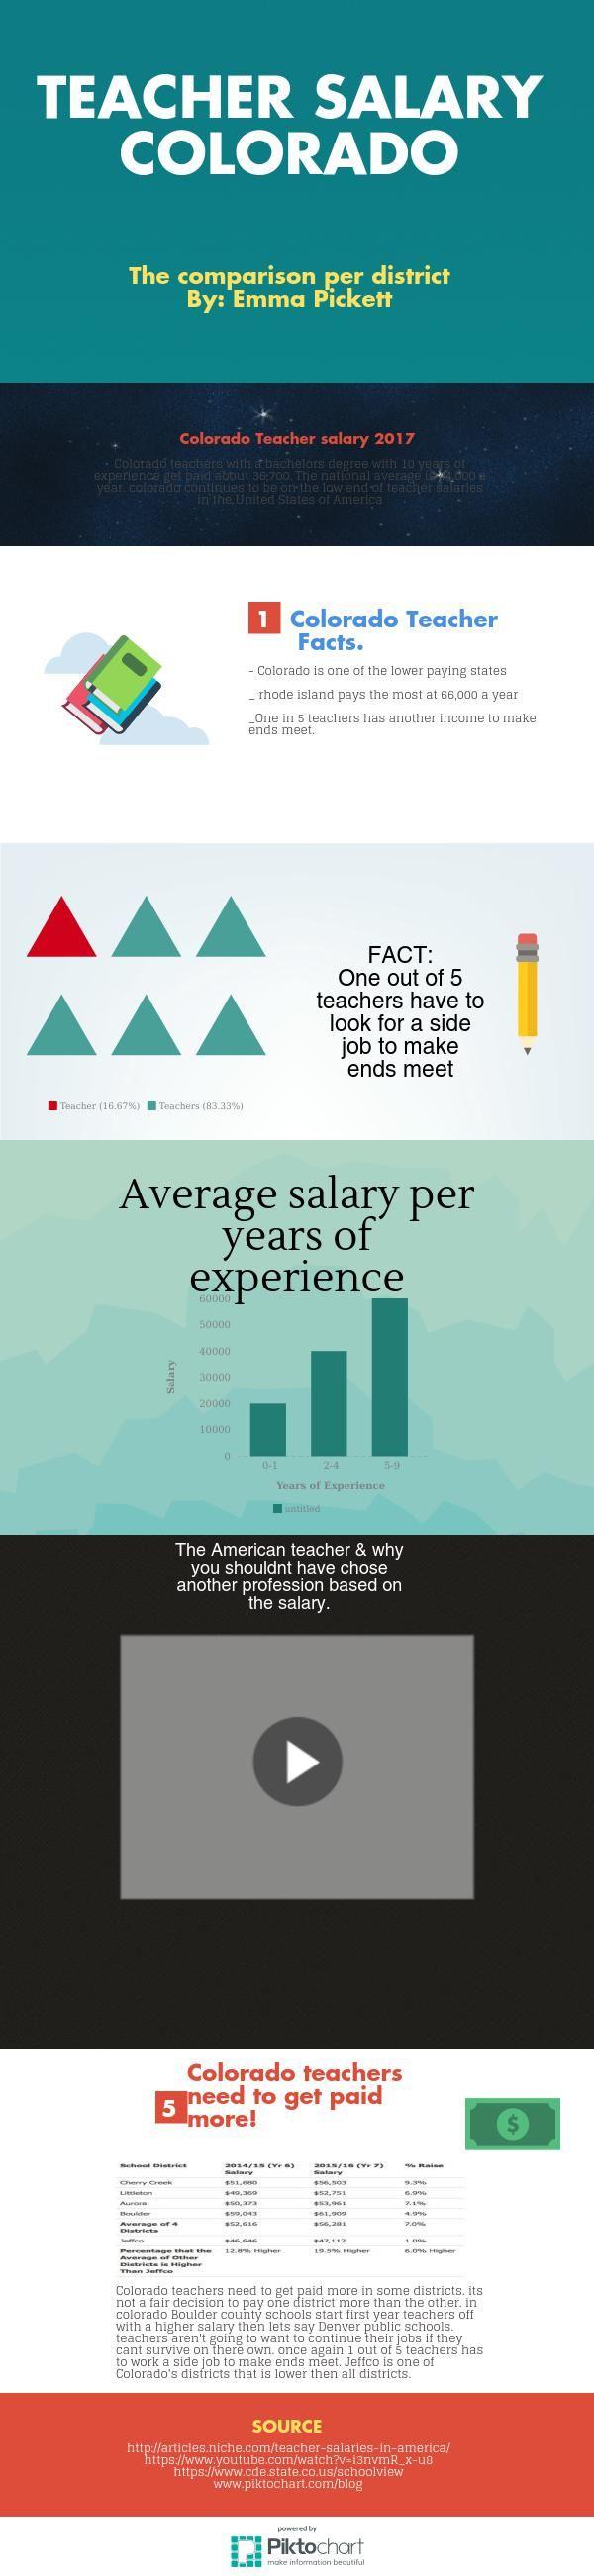 Colorado teacher salary | @Piktochart Infographic